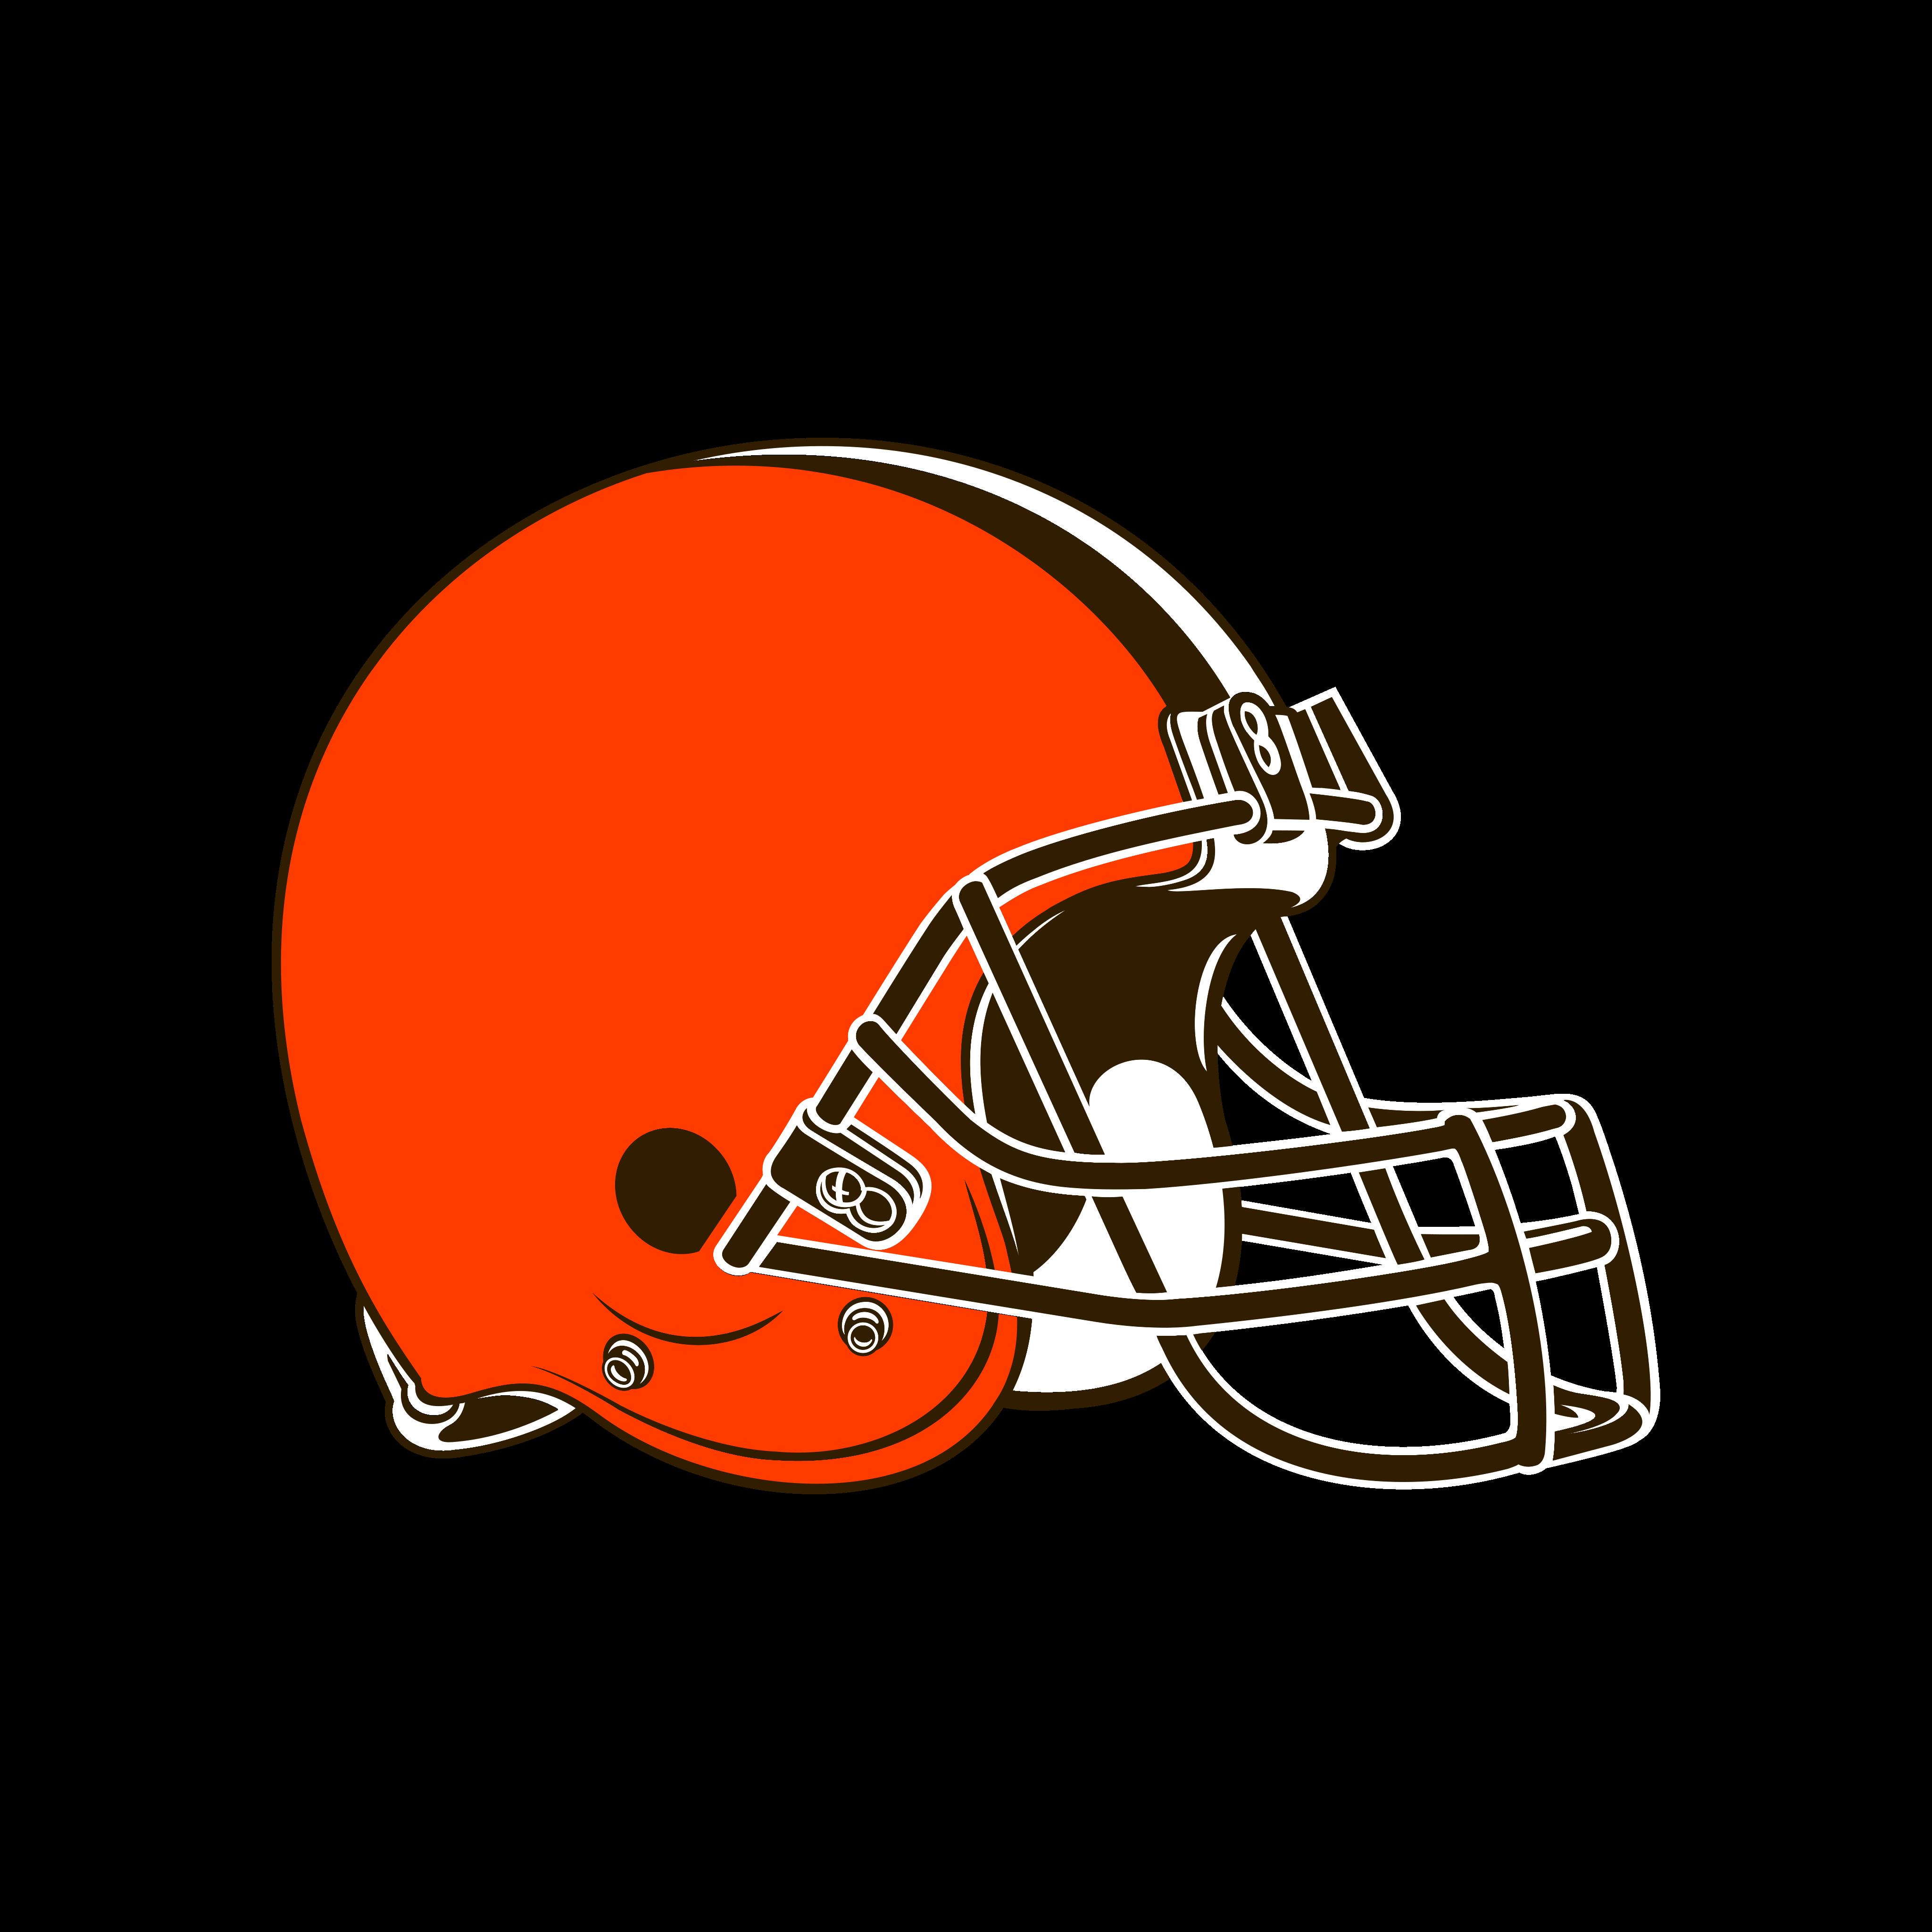 cleveland browns logo 0 - Cleveland Browns Logo